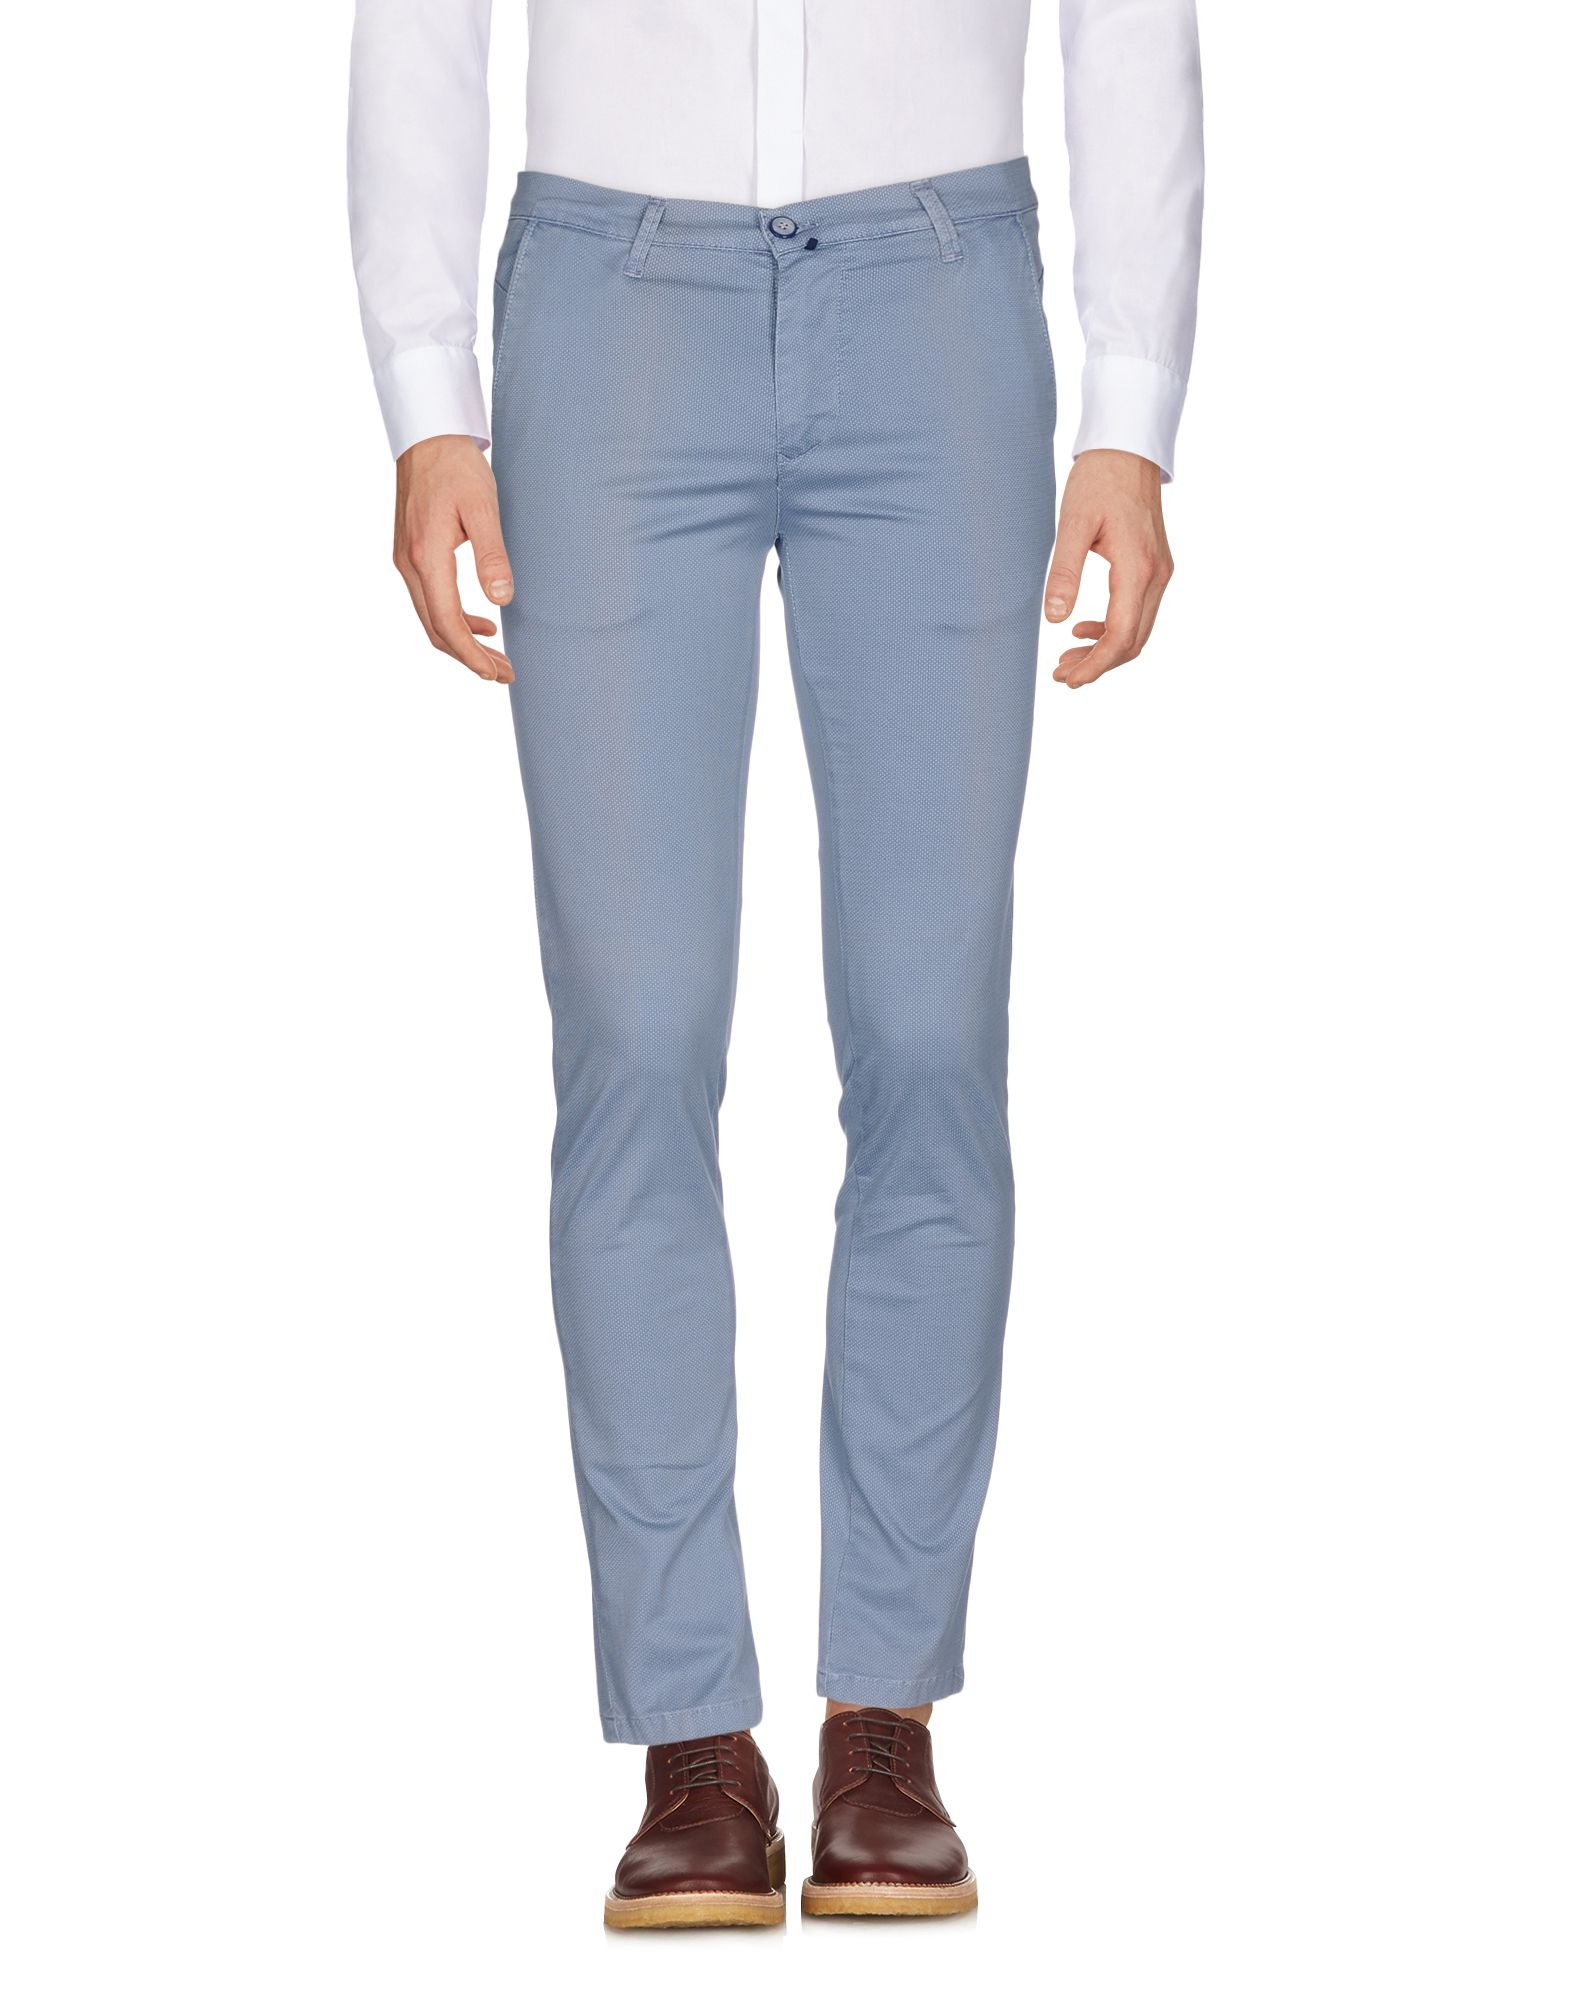 Pantalone Vincent Trade Uomo Uomo Trade - 13080571TG 76152d